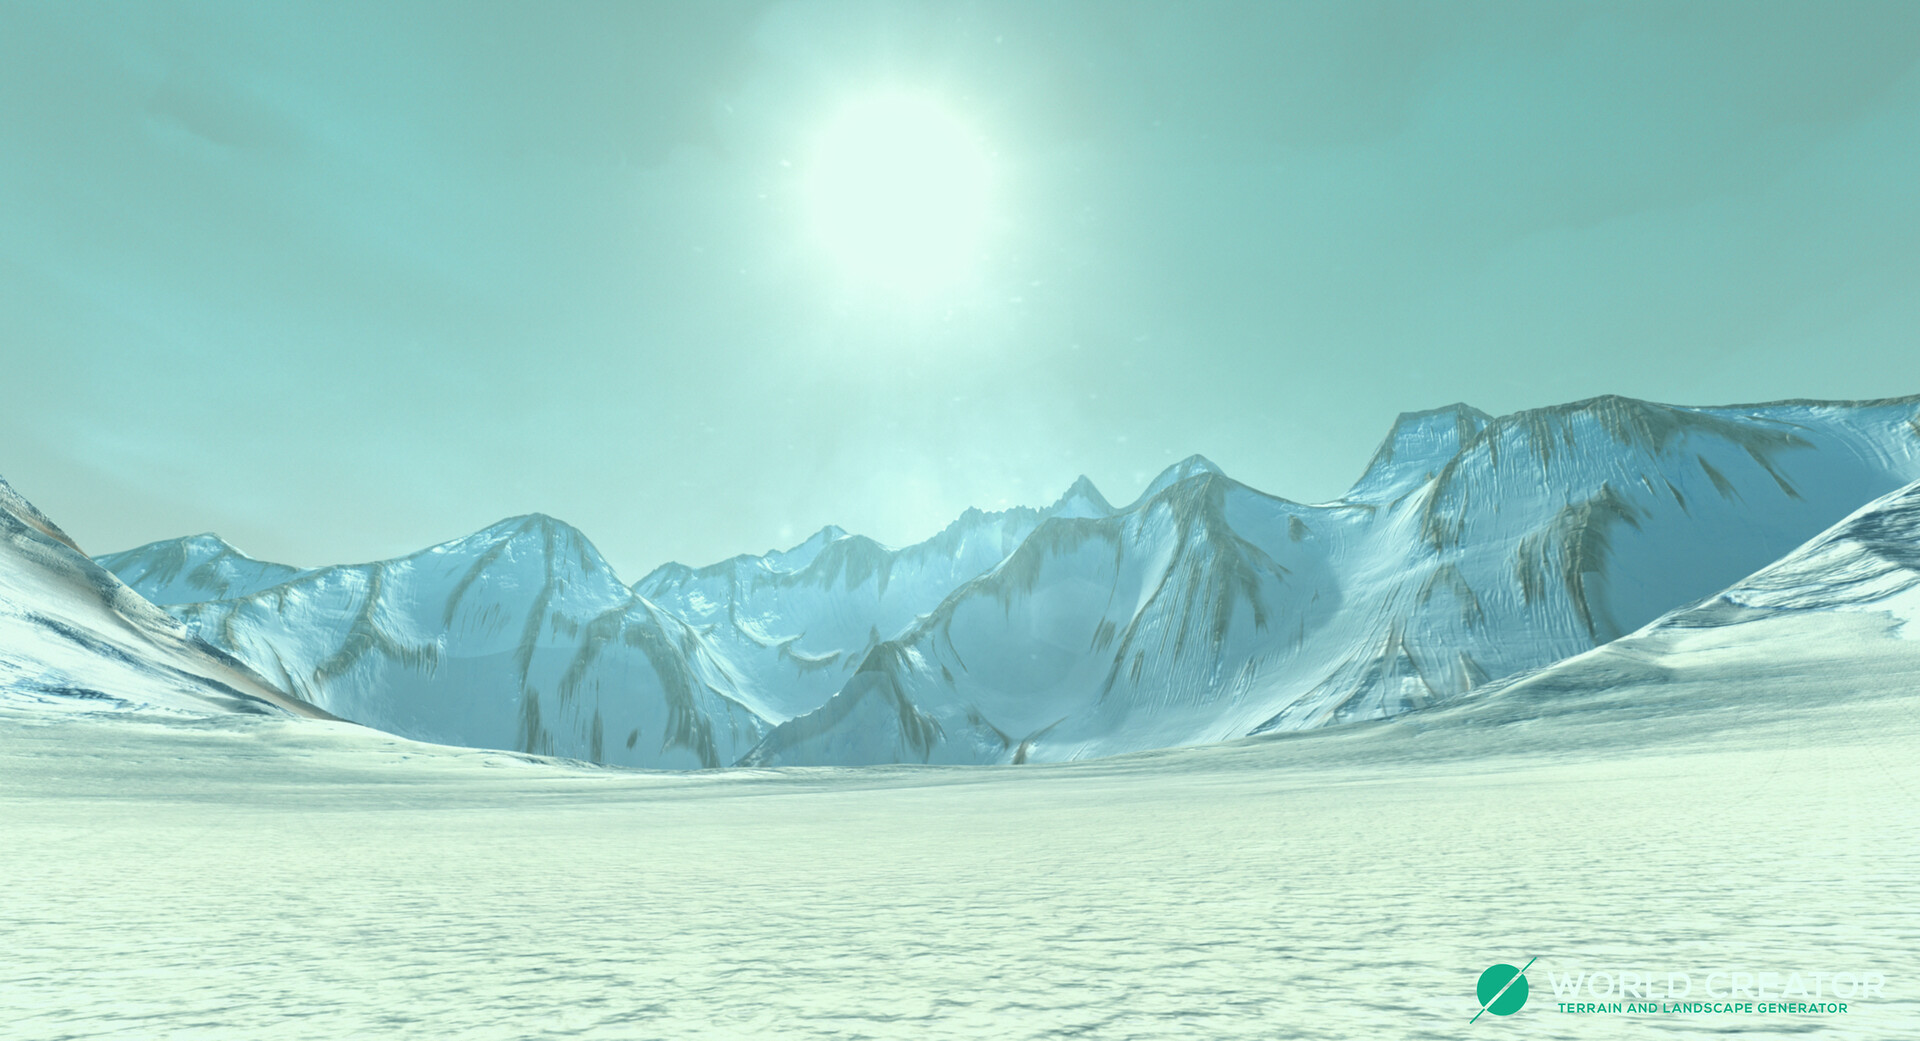 david-pistelak-alpines-6.jpg